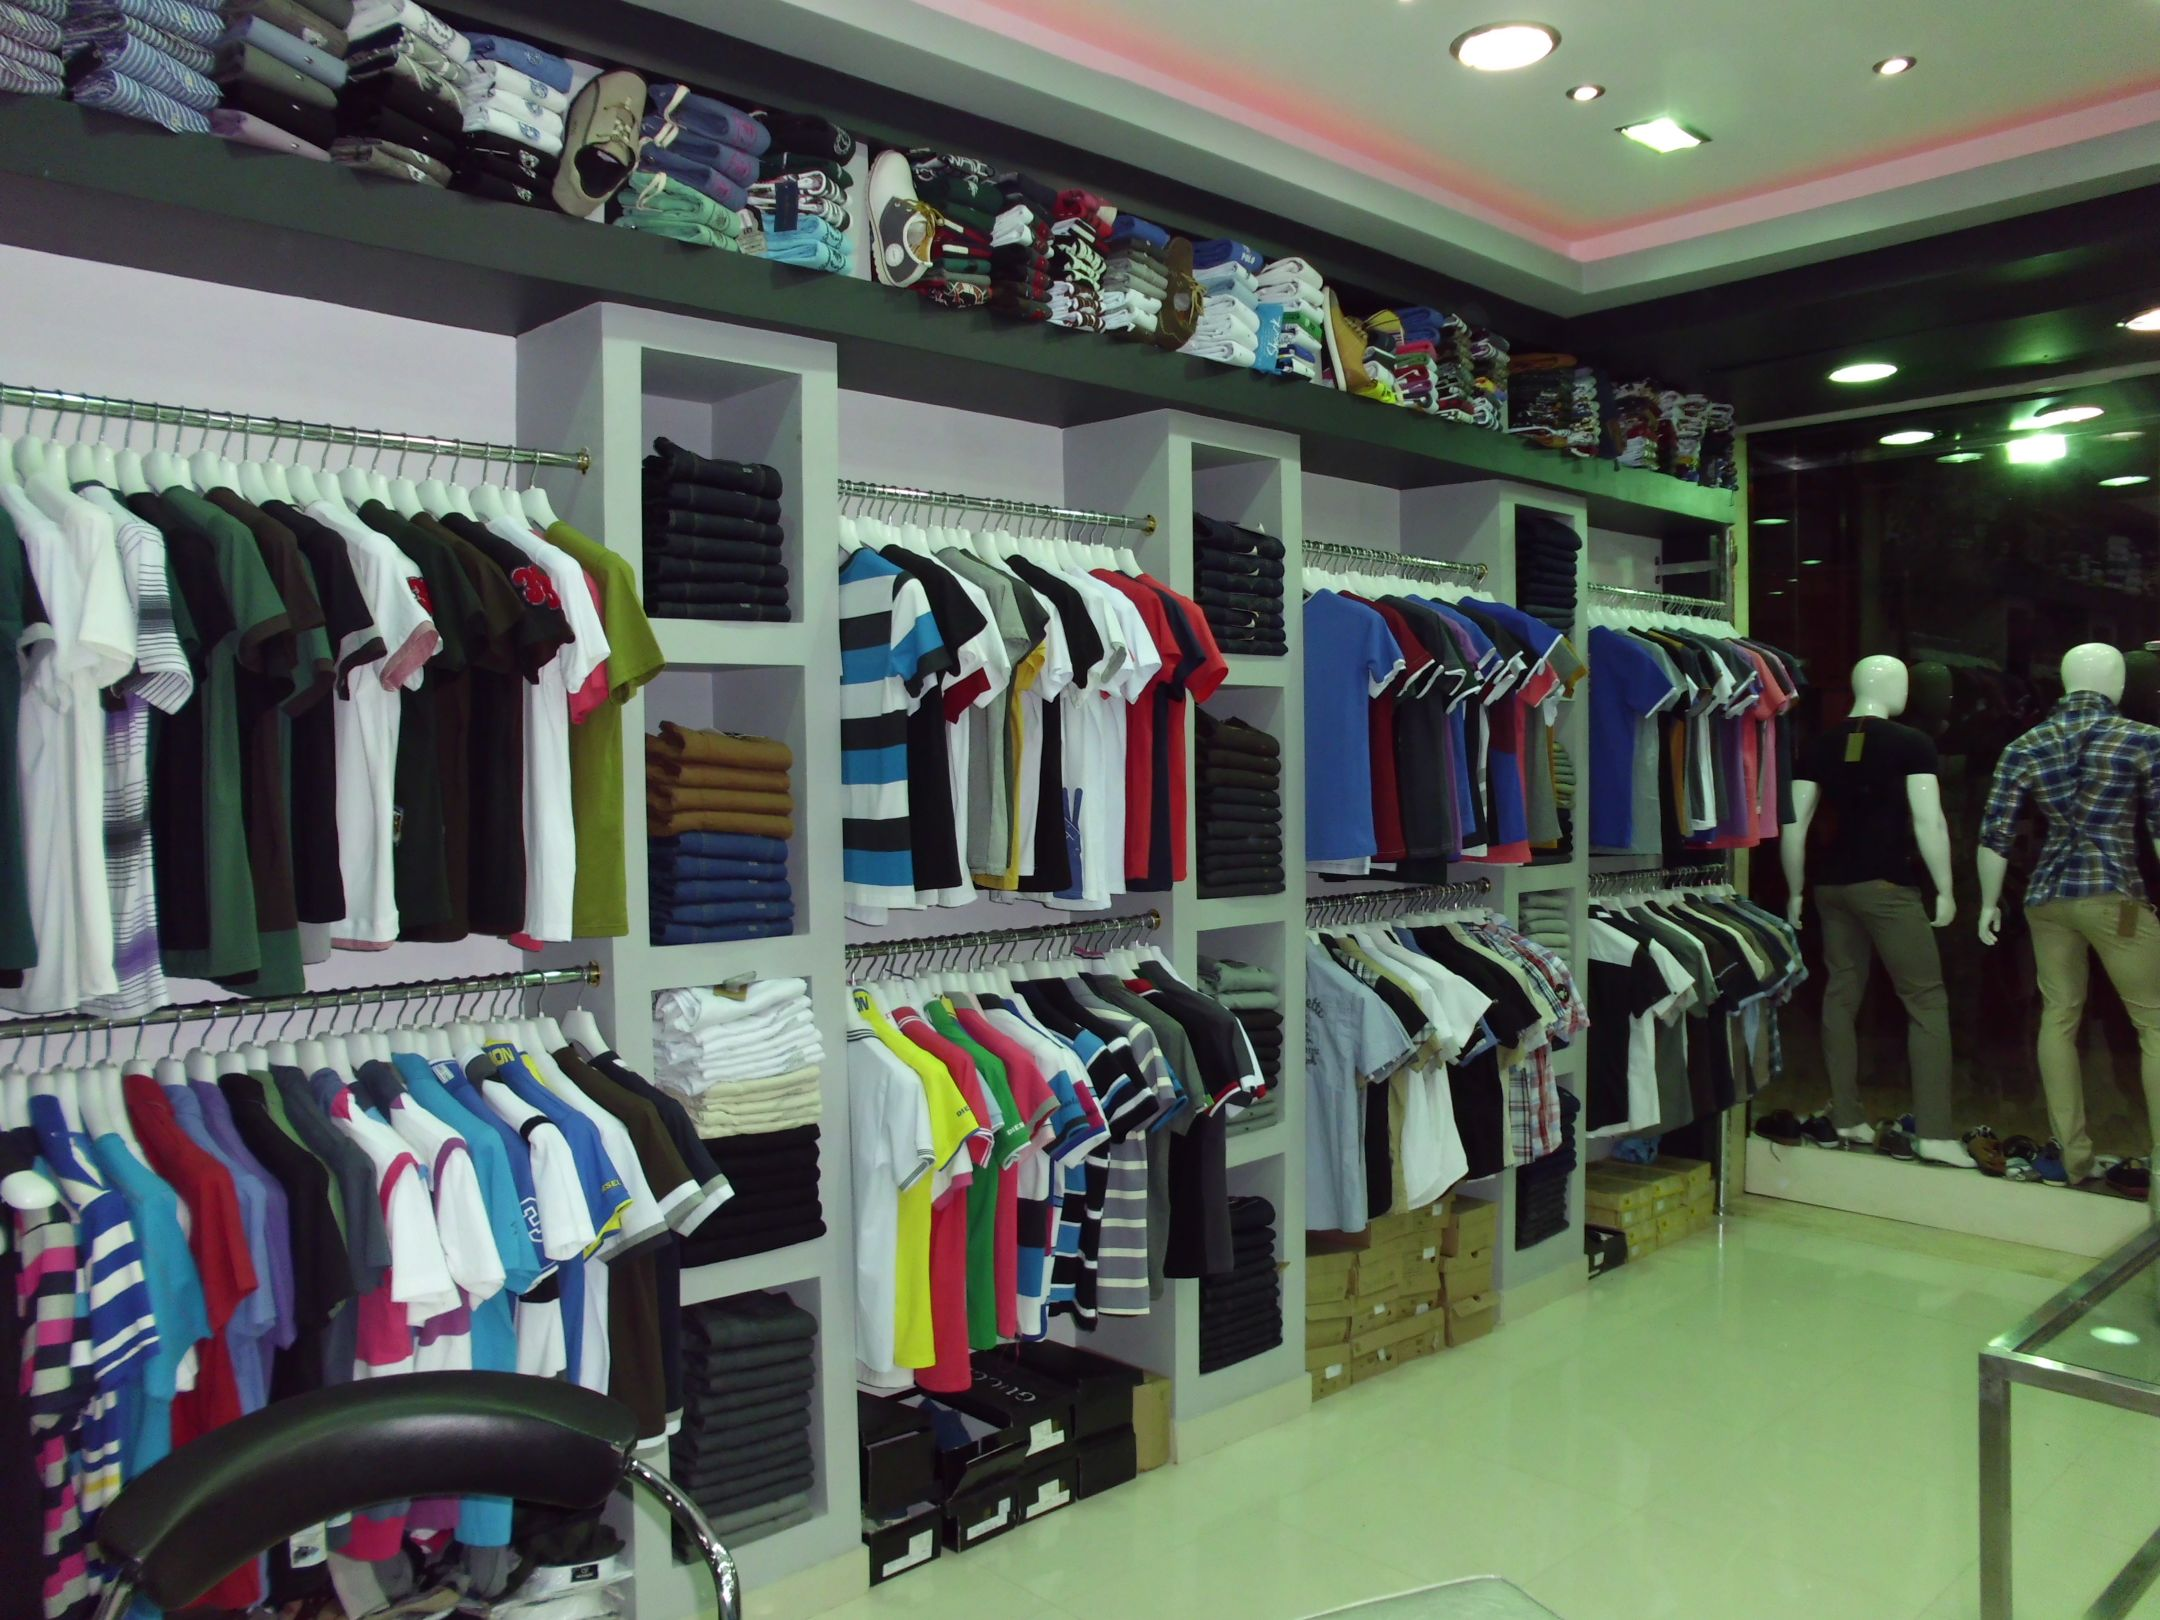 بالصور محلات ملابس , اكبر محلات للملابس 5778 8